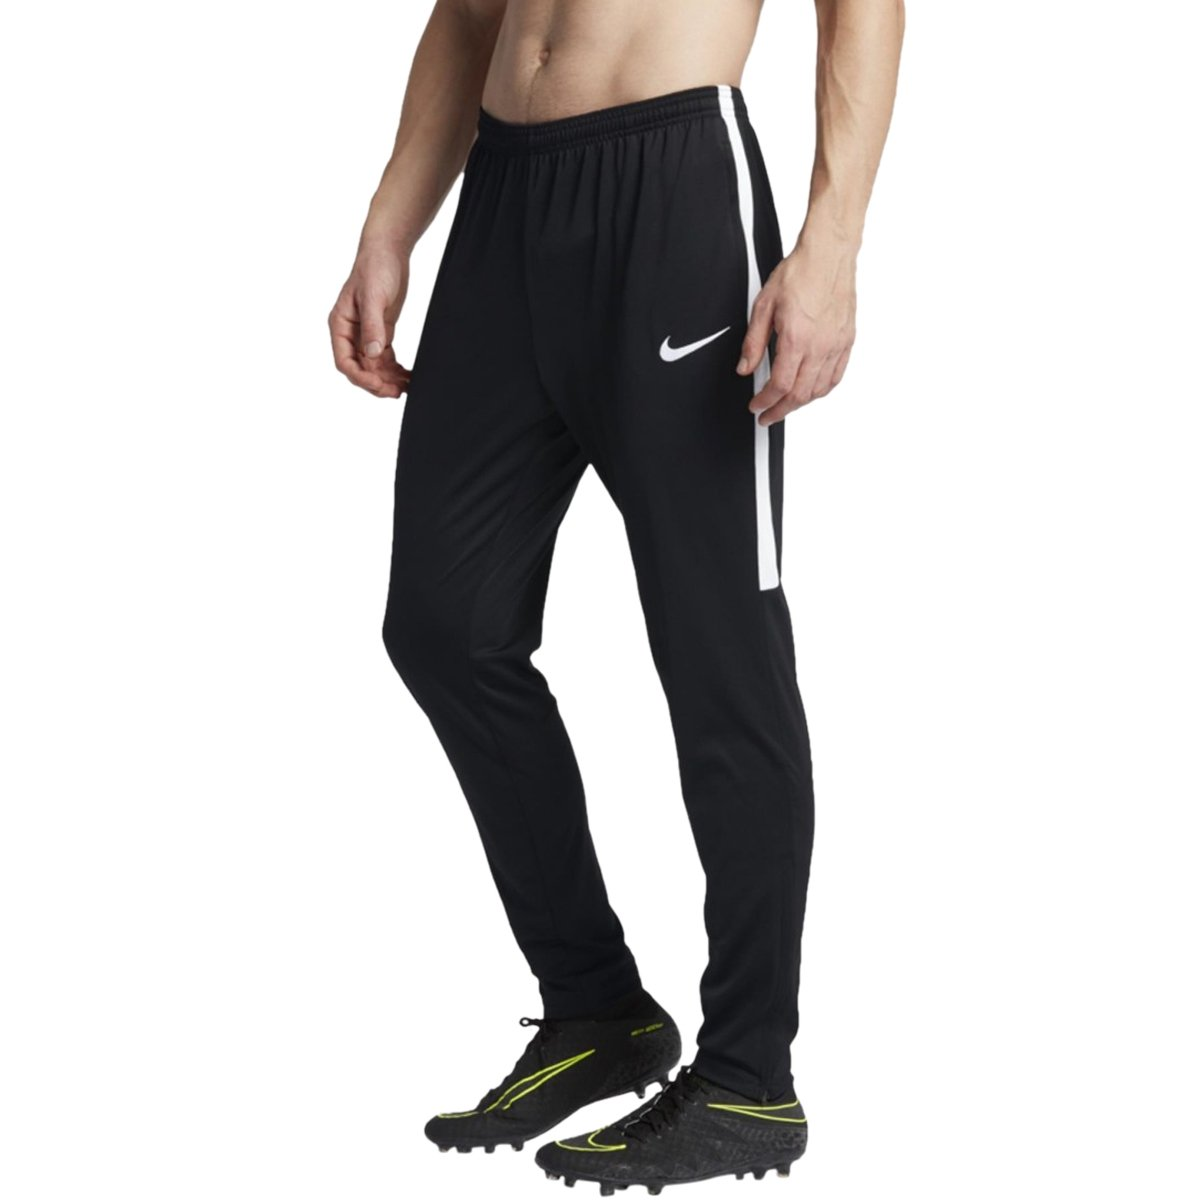 ... Bizz Store - Calça Masculina Nike Dry Pant Academy Preta 6638afb763b794  ... 8b5b3ca79ea9e